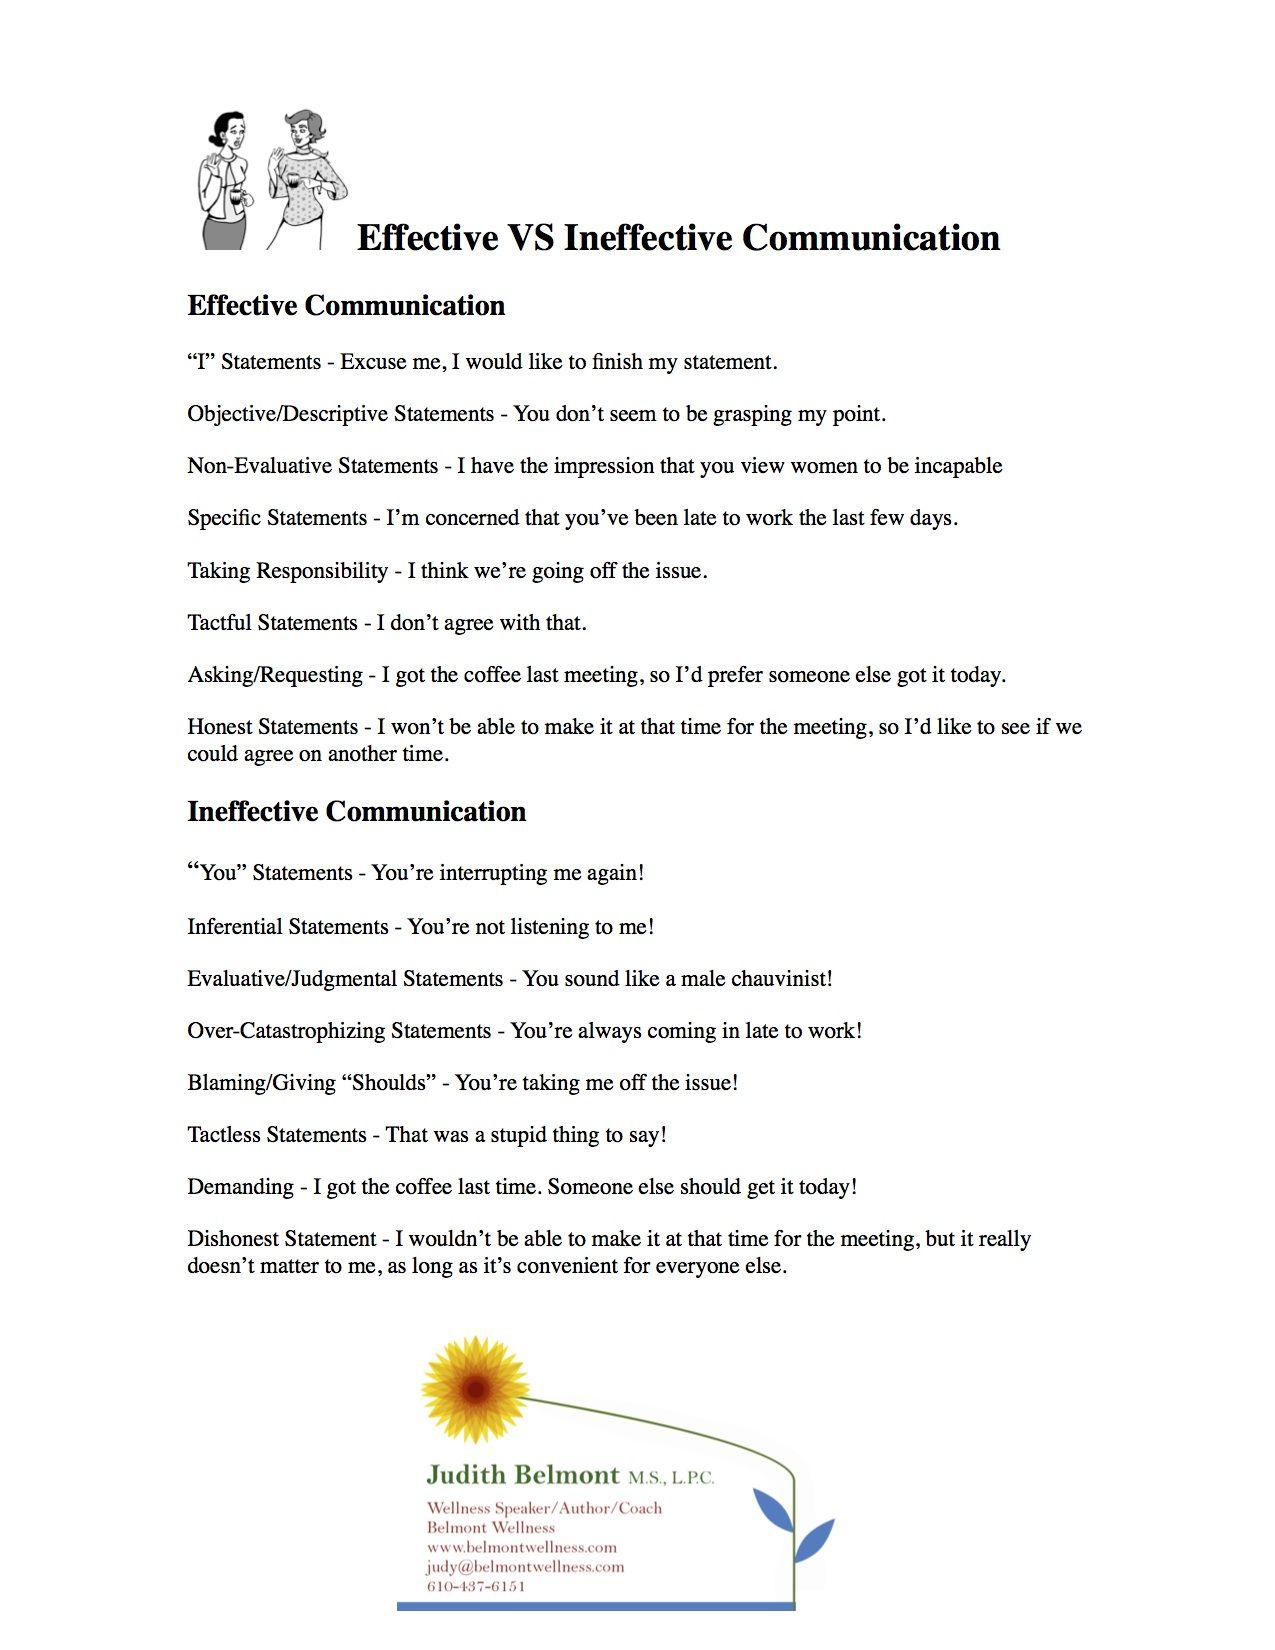 Effective Vs Ineffective Communication Psychology